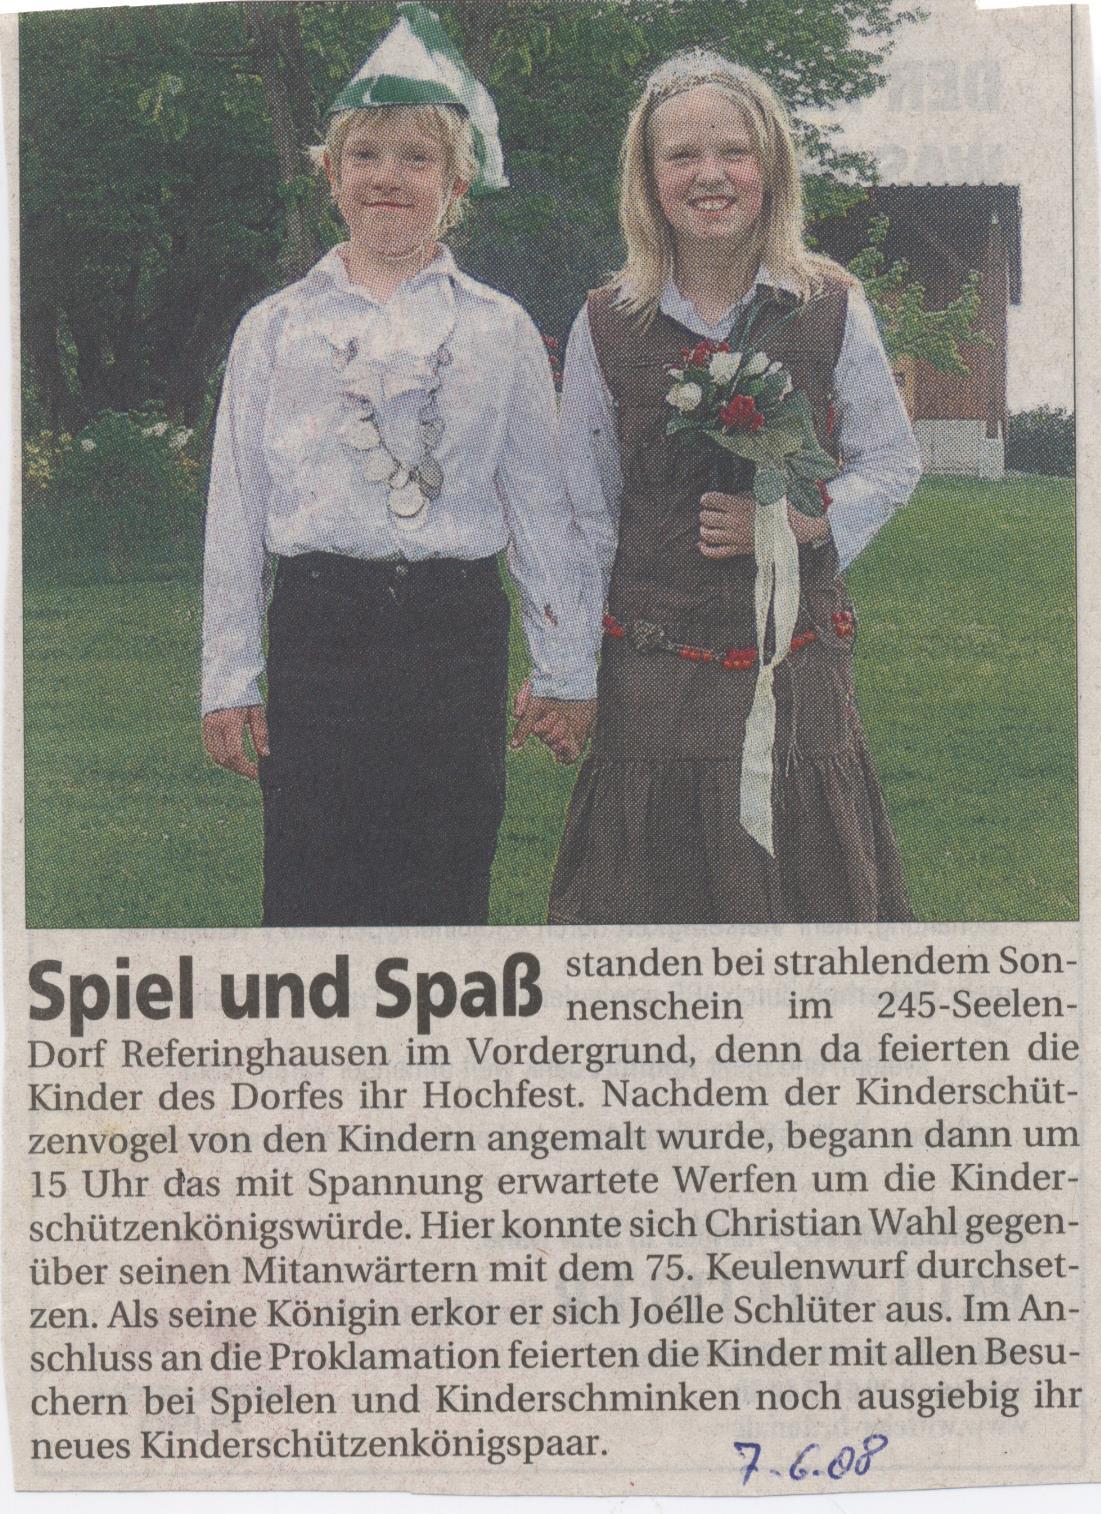 Kinderschützenkönigspaar Christian und Joélle